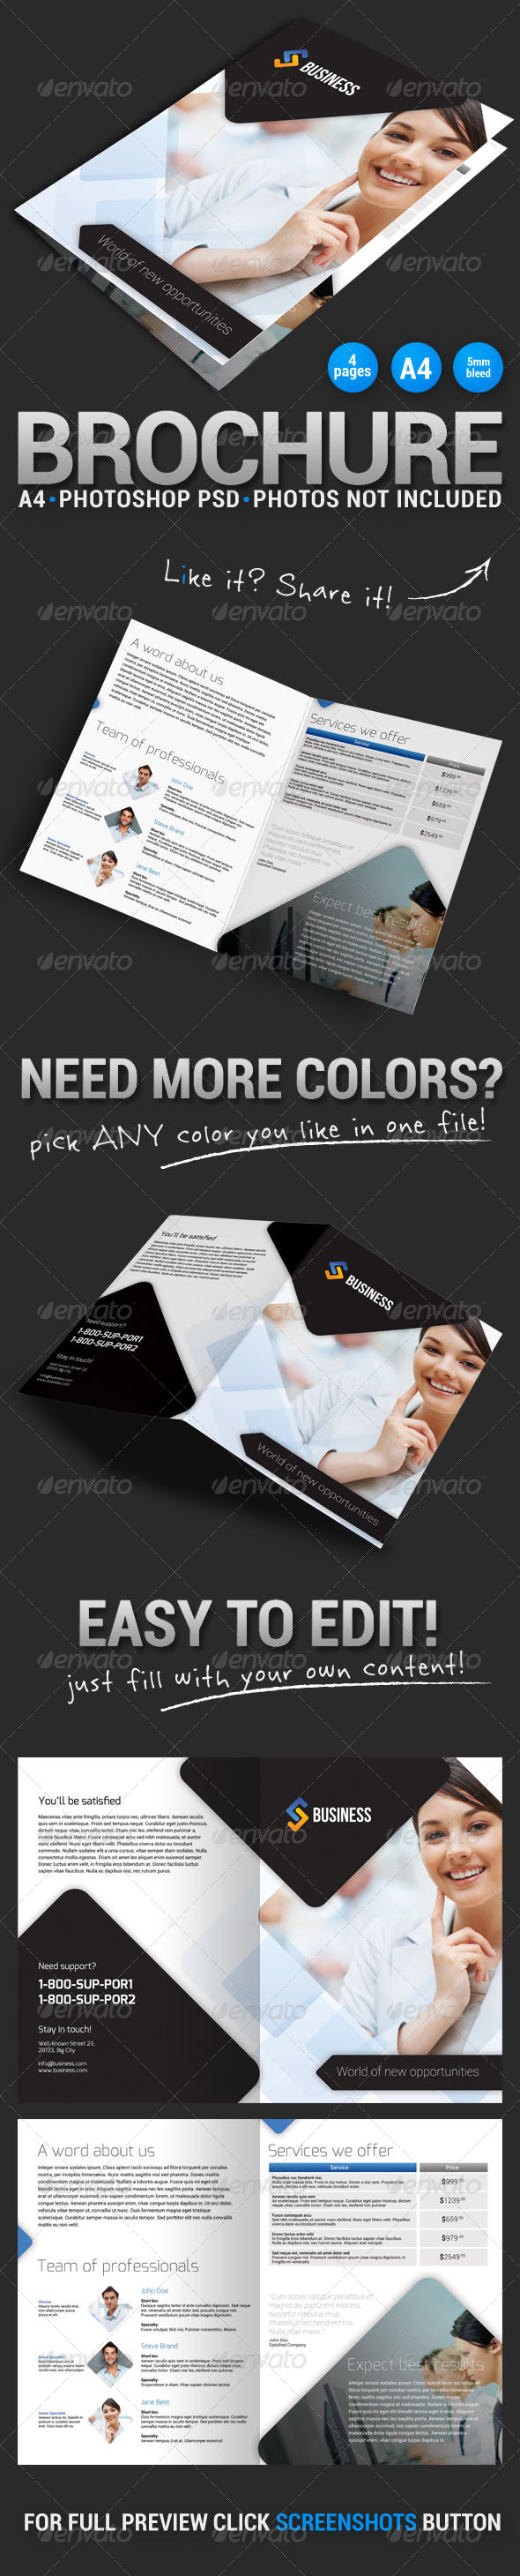 GraphicRiver Bi-fold Brochure 1 5178877